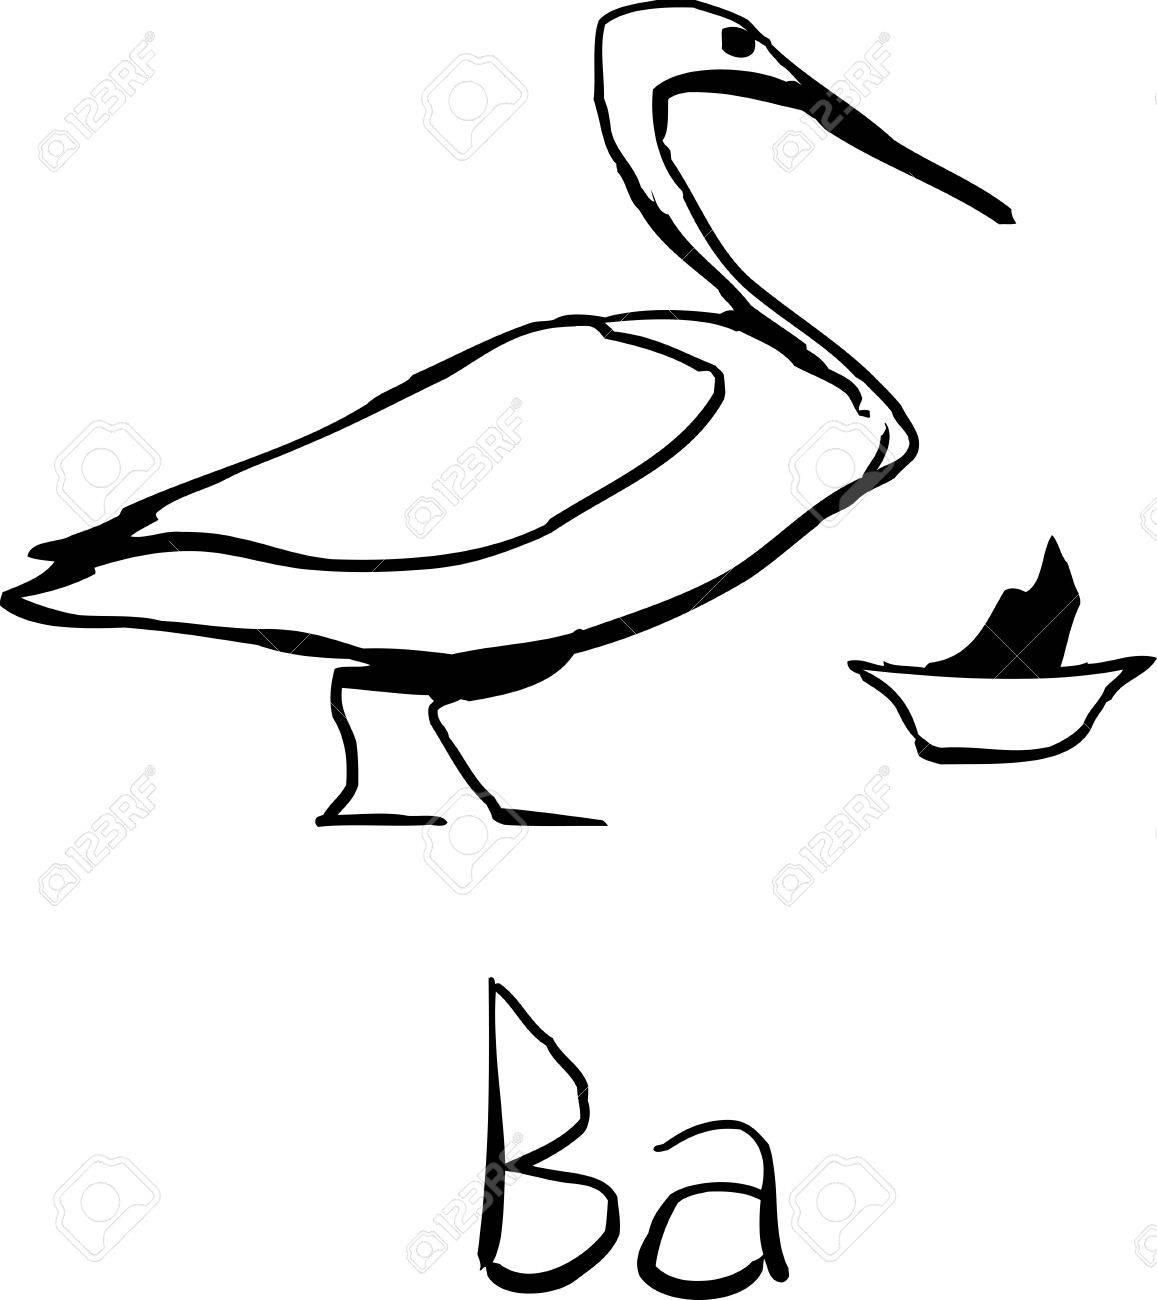 Outline sketch of ancient egyptian bird symbol representing the outline sketch of ancient egyptian bird symbol representing the vital force of the gods stock vector biocorpaavc